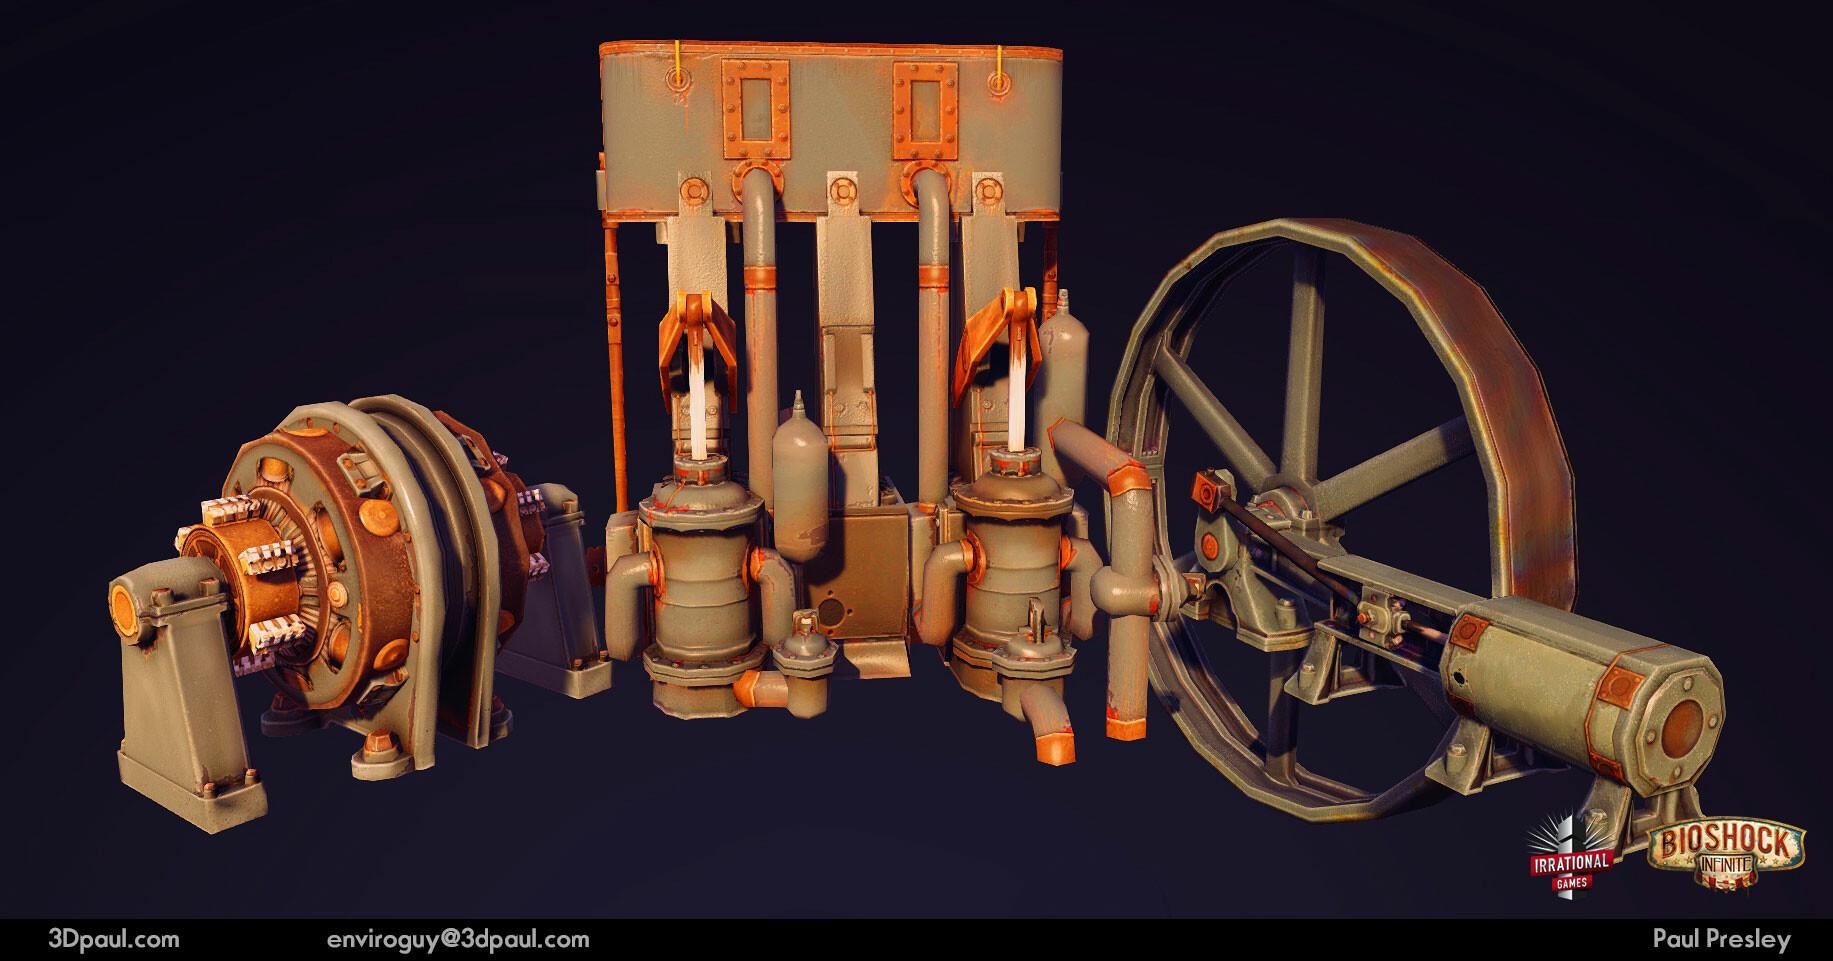 Paul presley 23 enginemachines